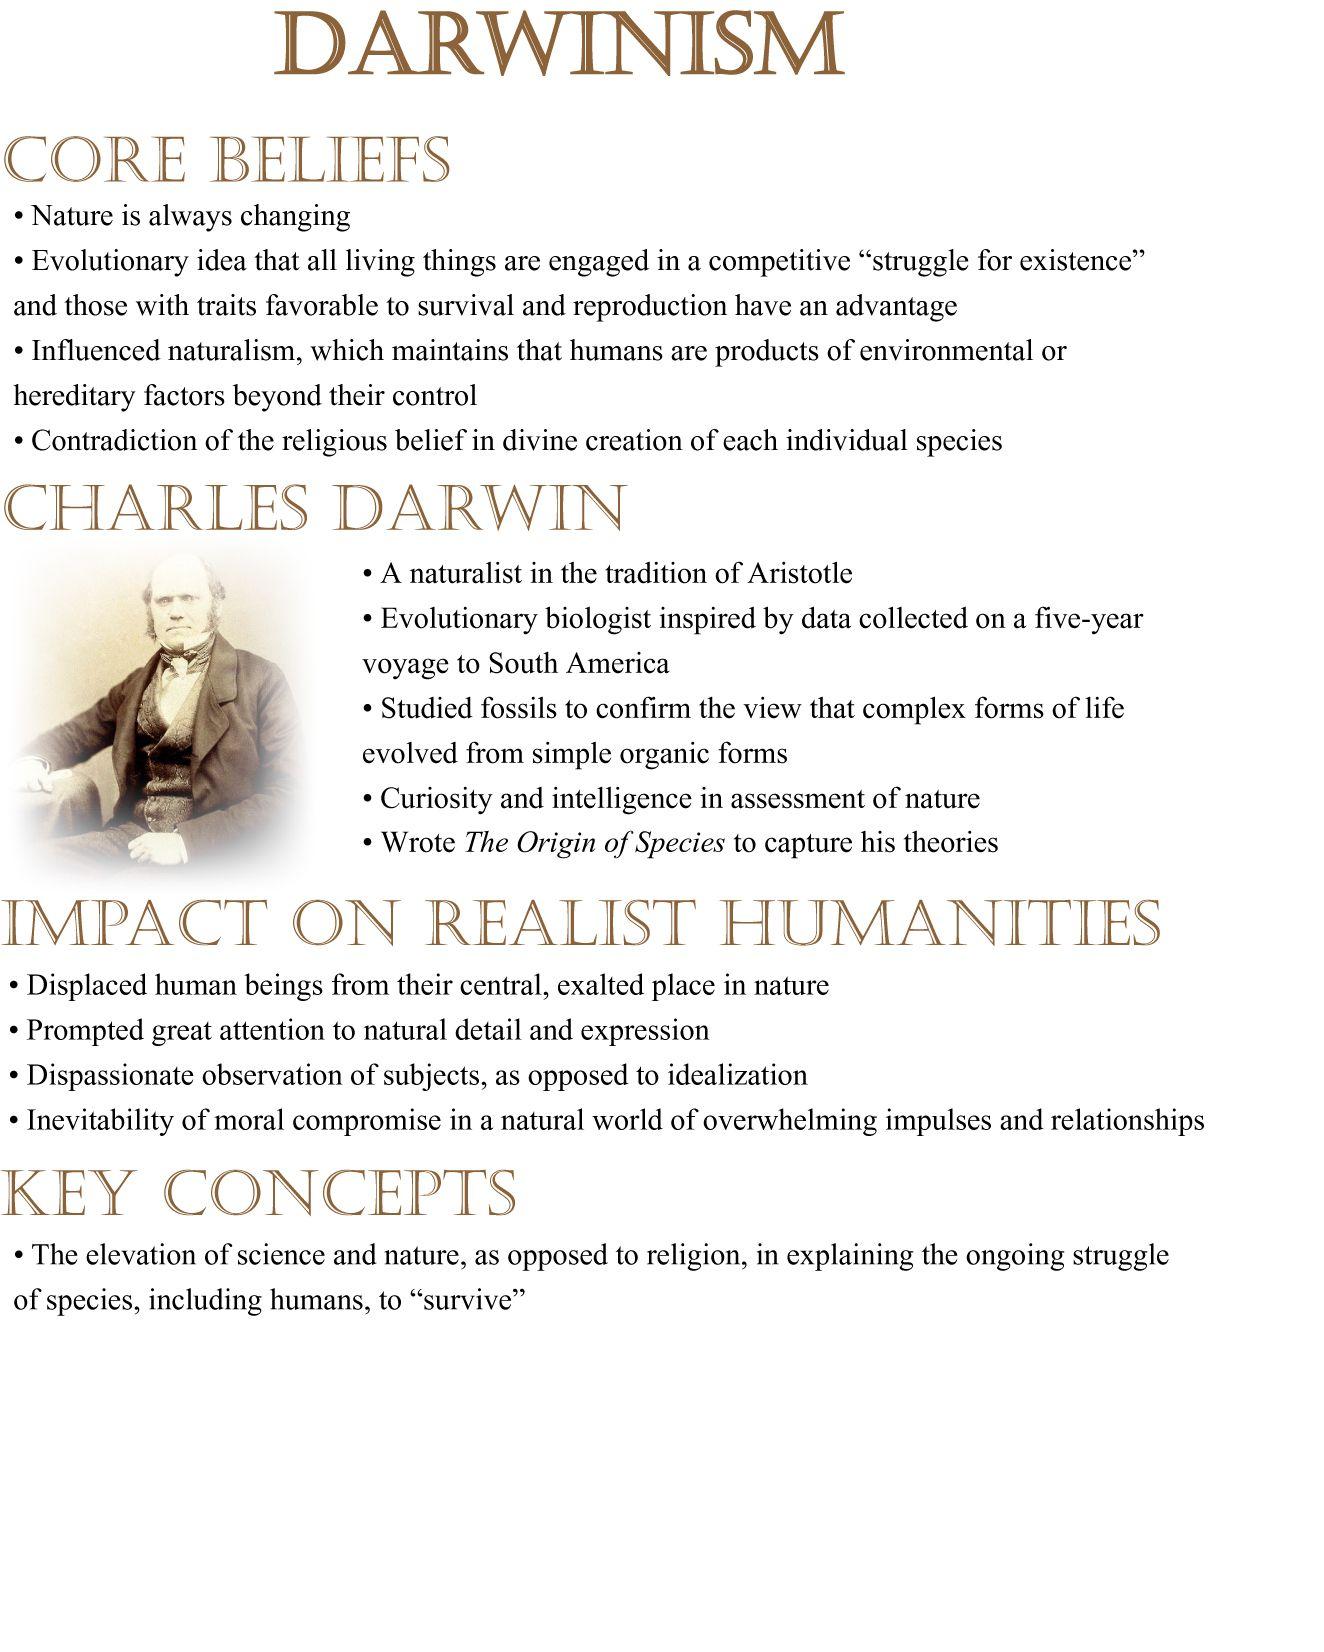 Darwinism | Philosophy of science, Philosophy theories ...